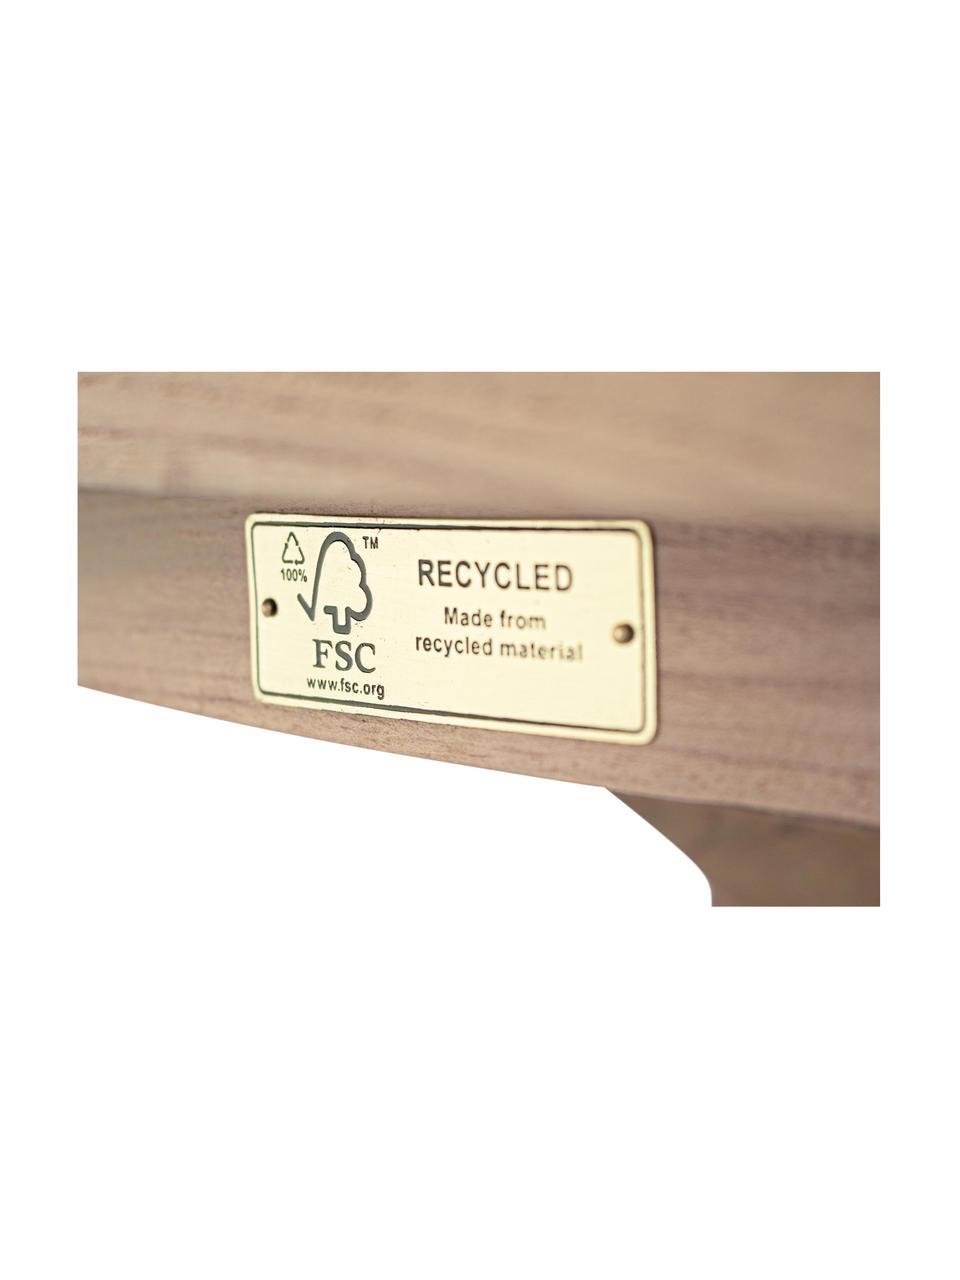 Ronde eettafel Rift met gerecycled teak blad, Ø 135 cm, Teakhout, gerecycled en FSC-gecertificeerd, Teak, Ø 135 x H 76 cm